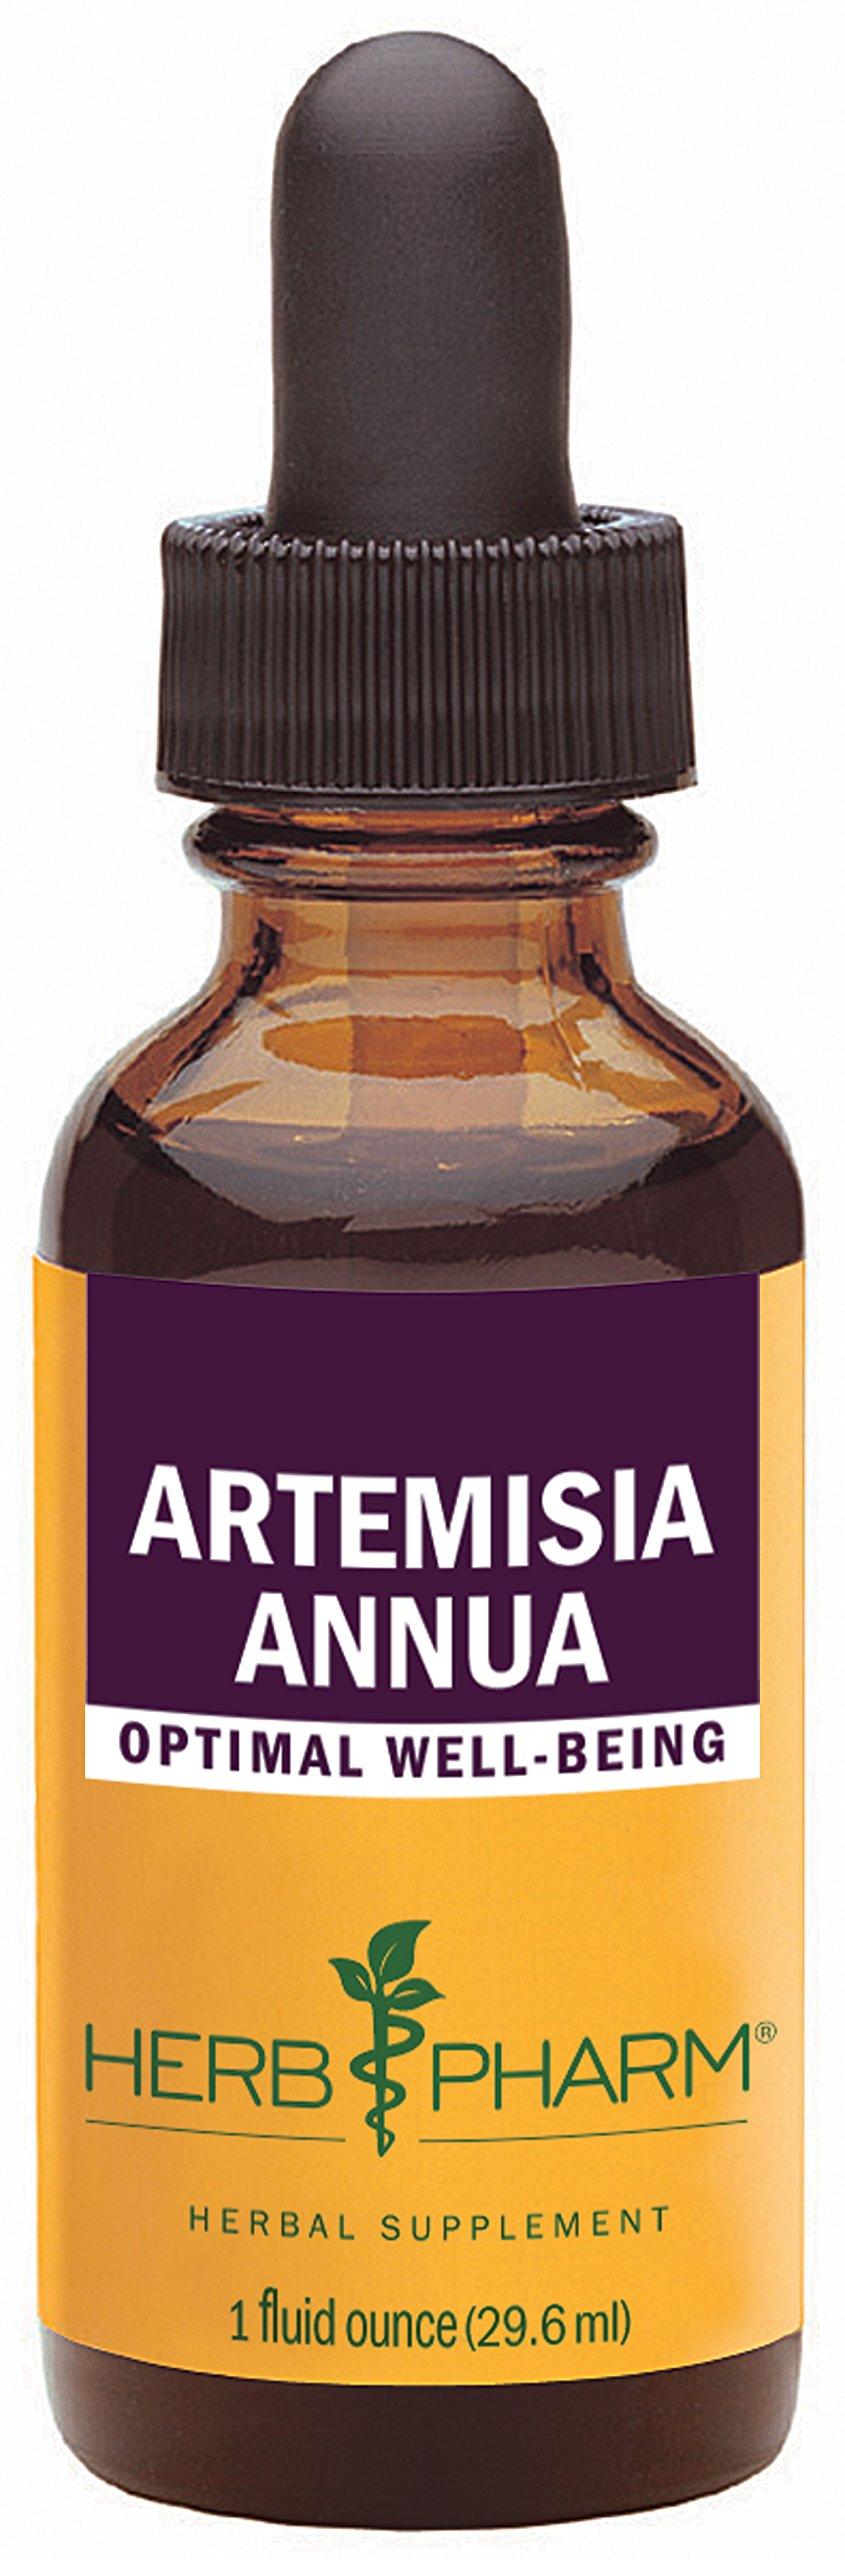 Herb Pharm Certified Organic Artemisia Annua (Sweet Annie) Extract - 1 Ounce